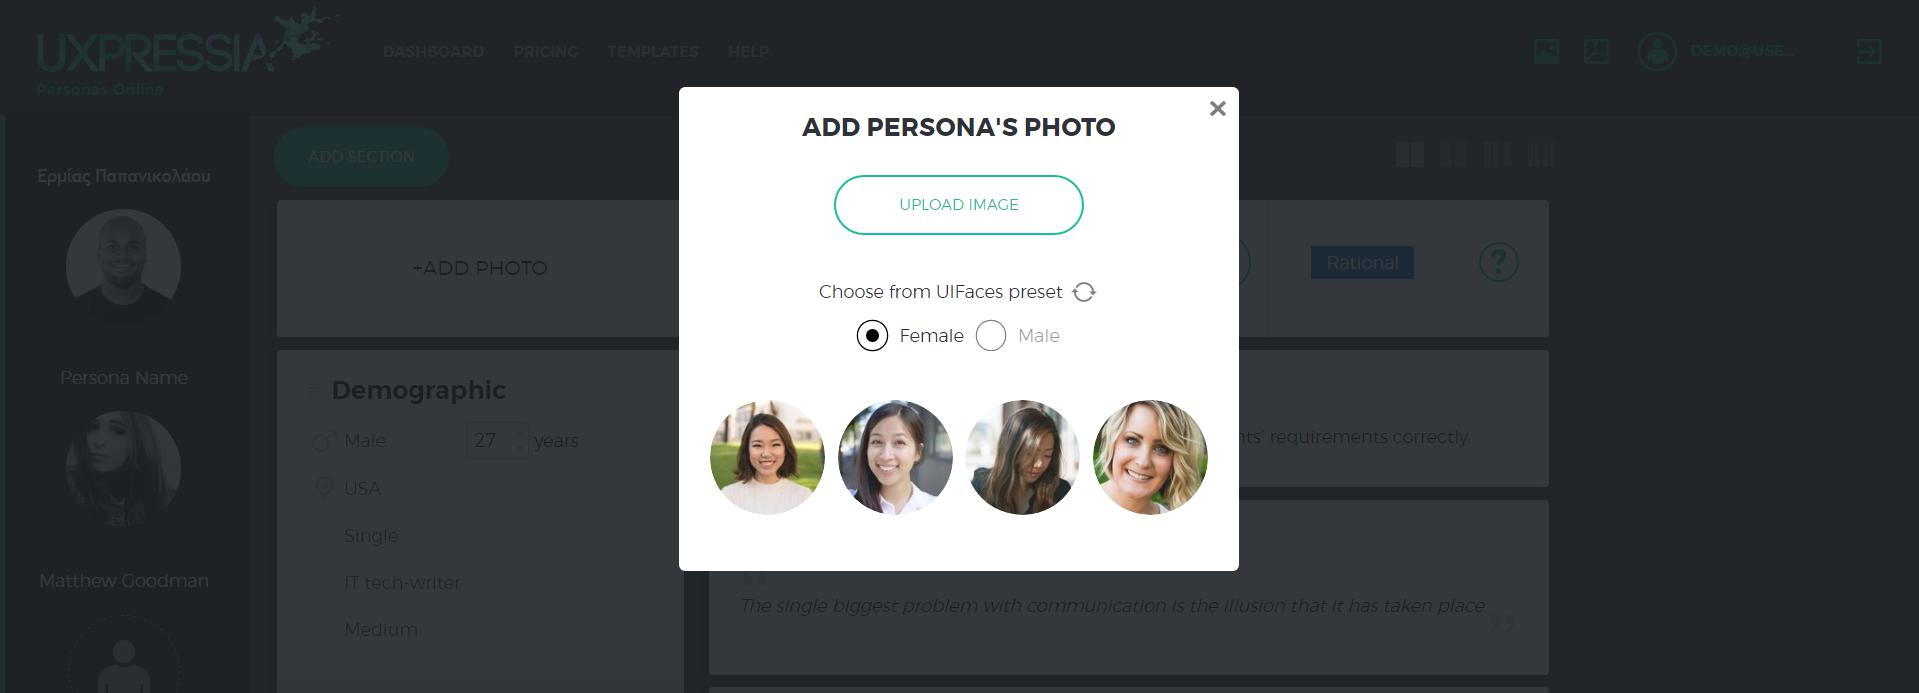 personas_photo_generator